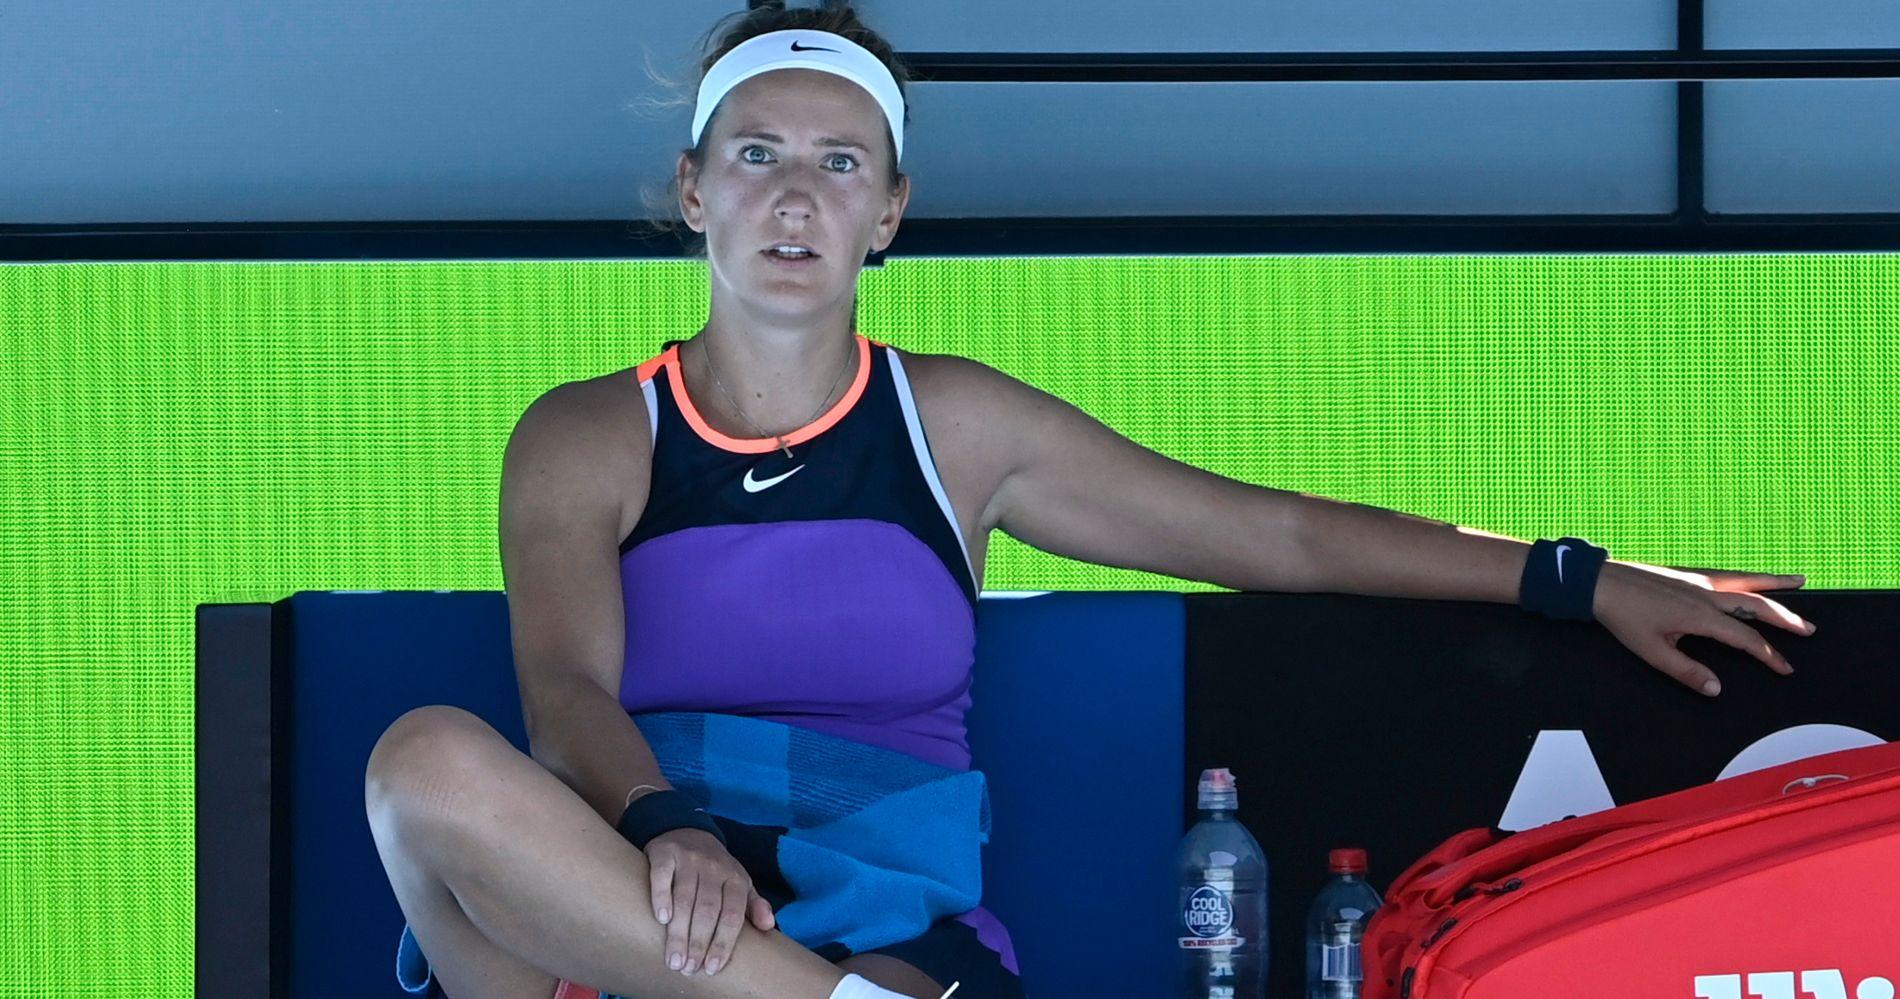 Victoria Azarenka, Open d'Australie 2021, 1er tour